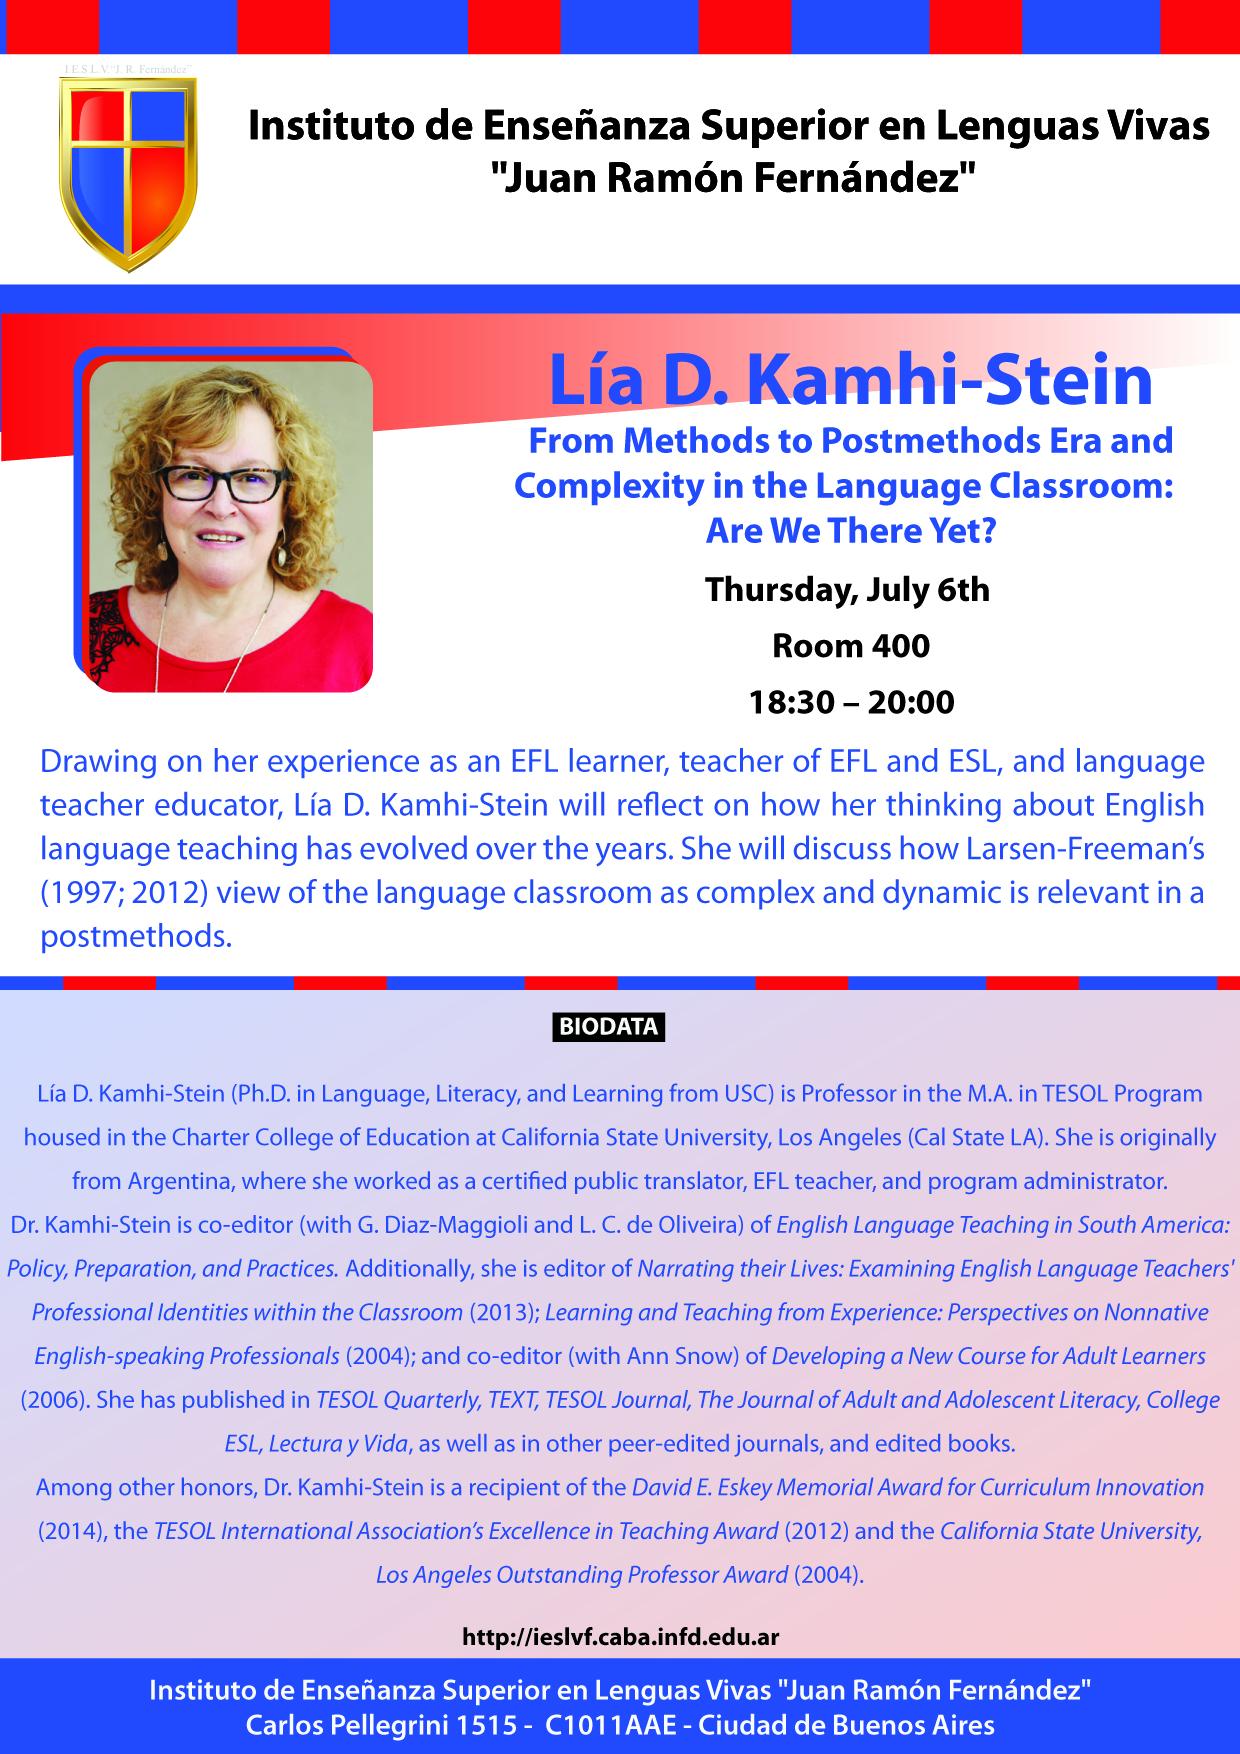 Lía D. Kamhi-Stein_July 6_18.30_20.00